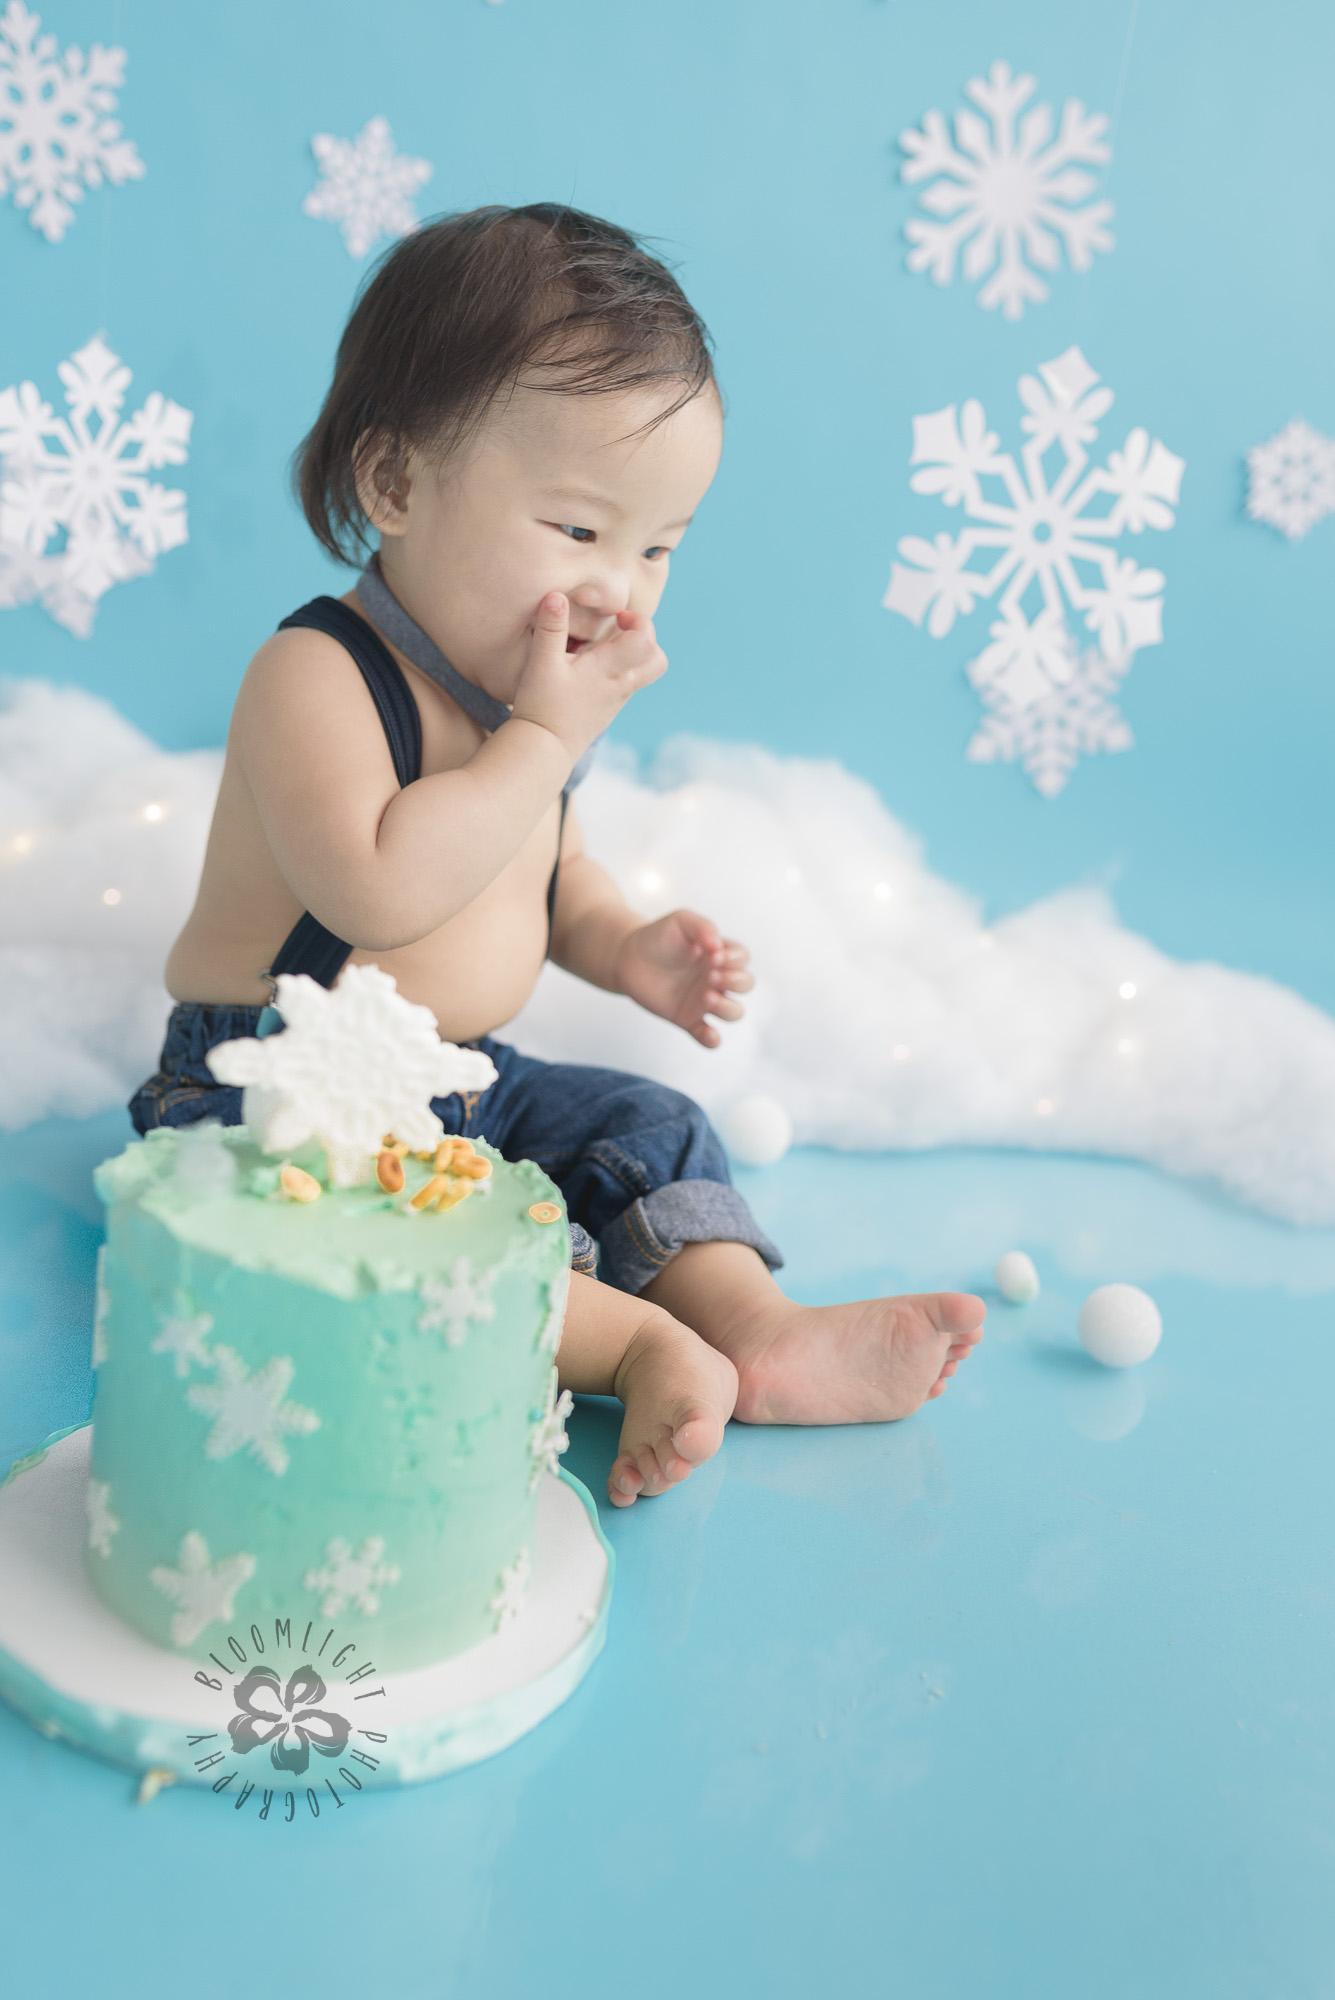 Toronto-North-York-baby-birthday-cake-smash-winter-snowflake-theme-photography (3).jpg